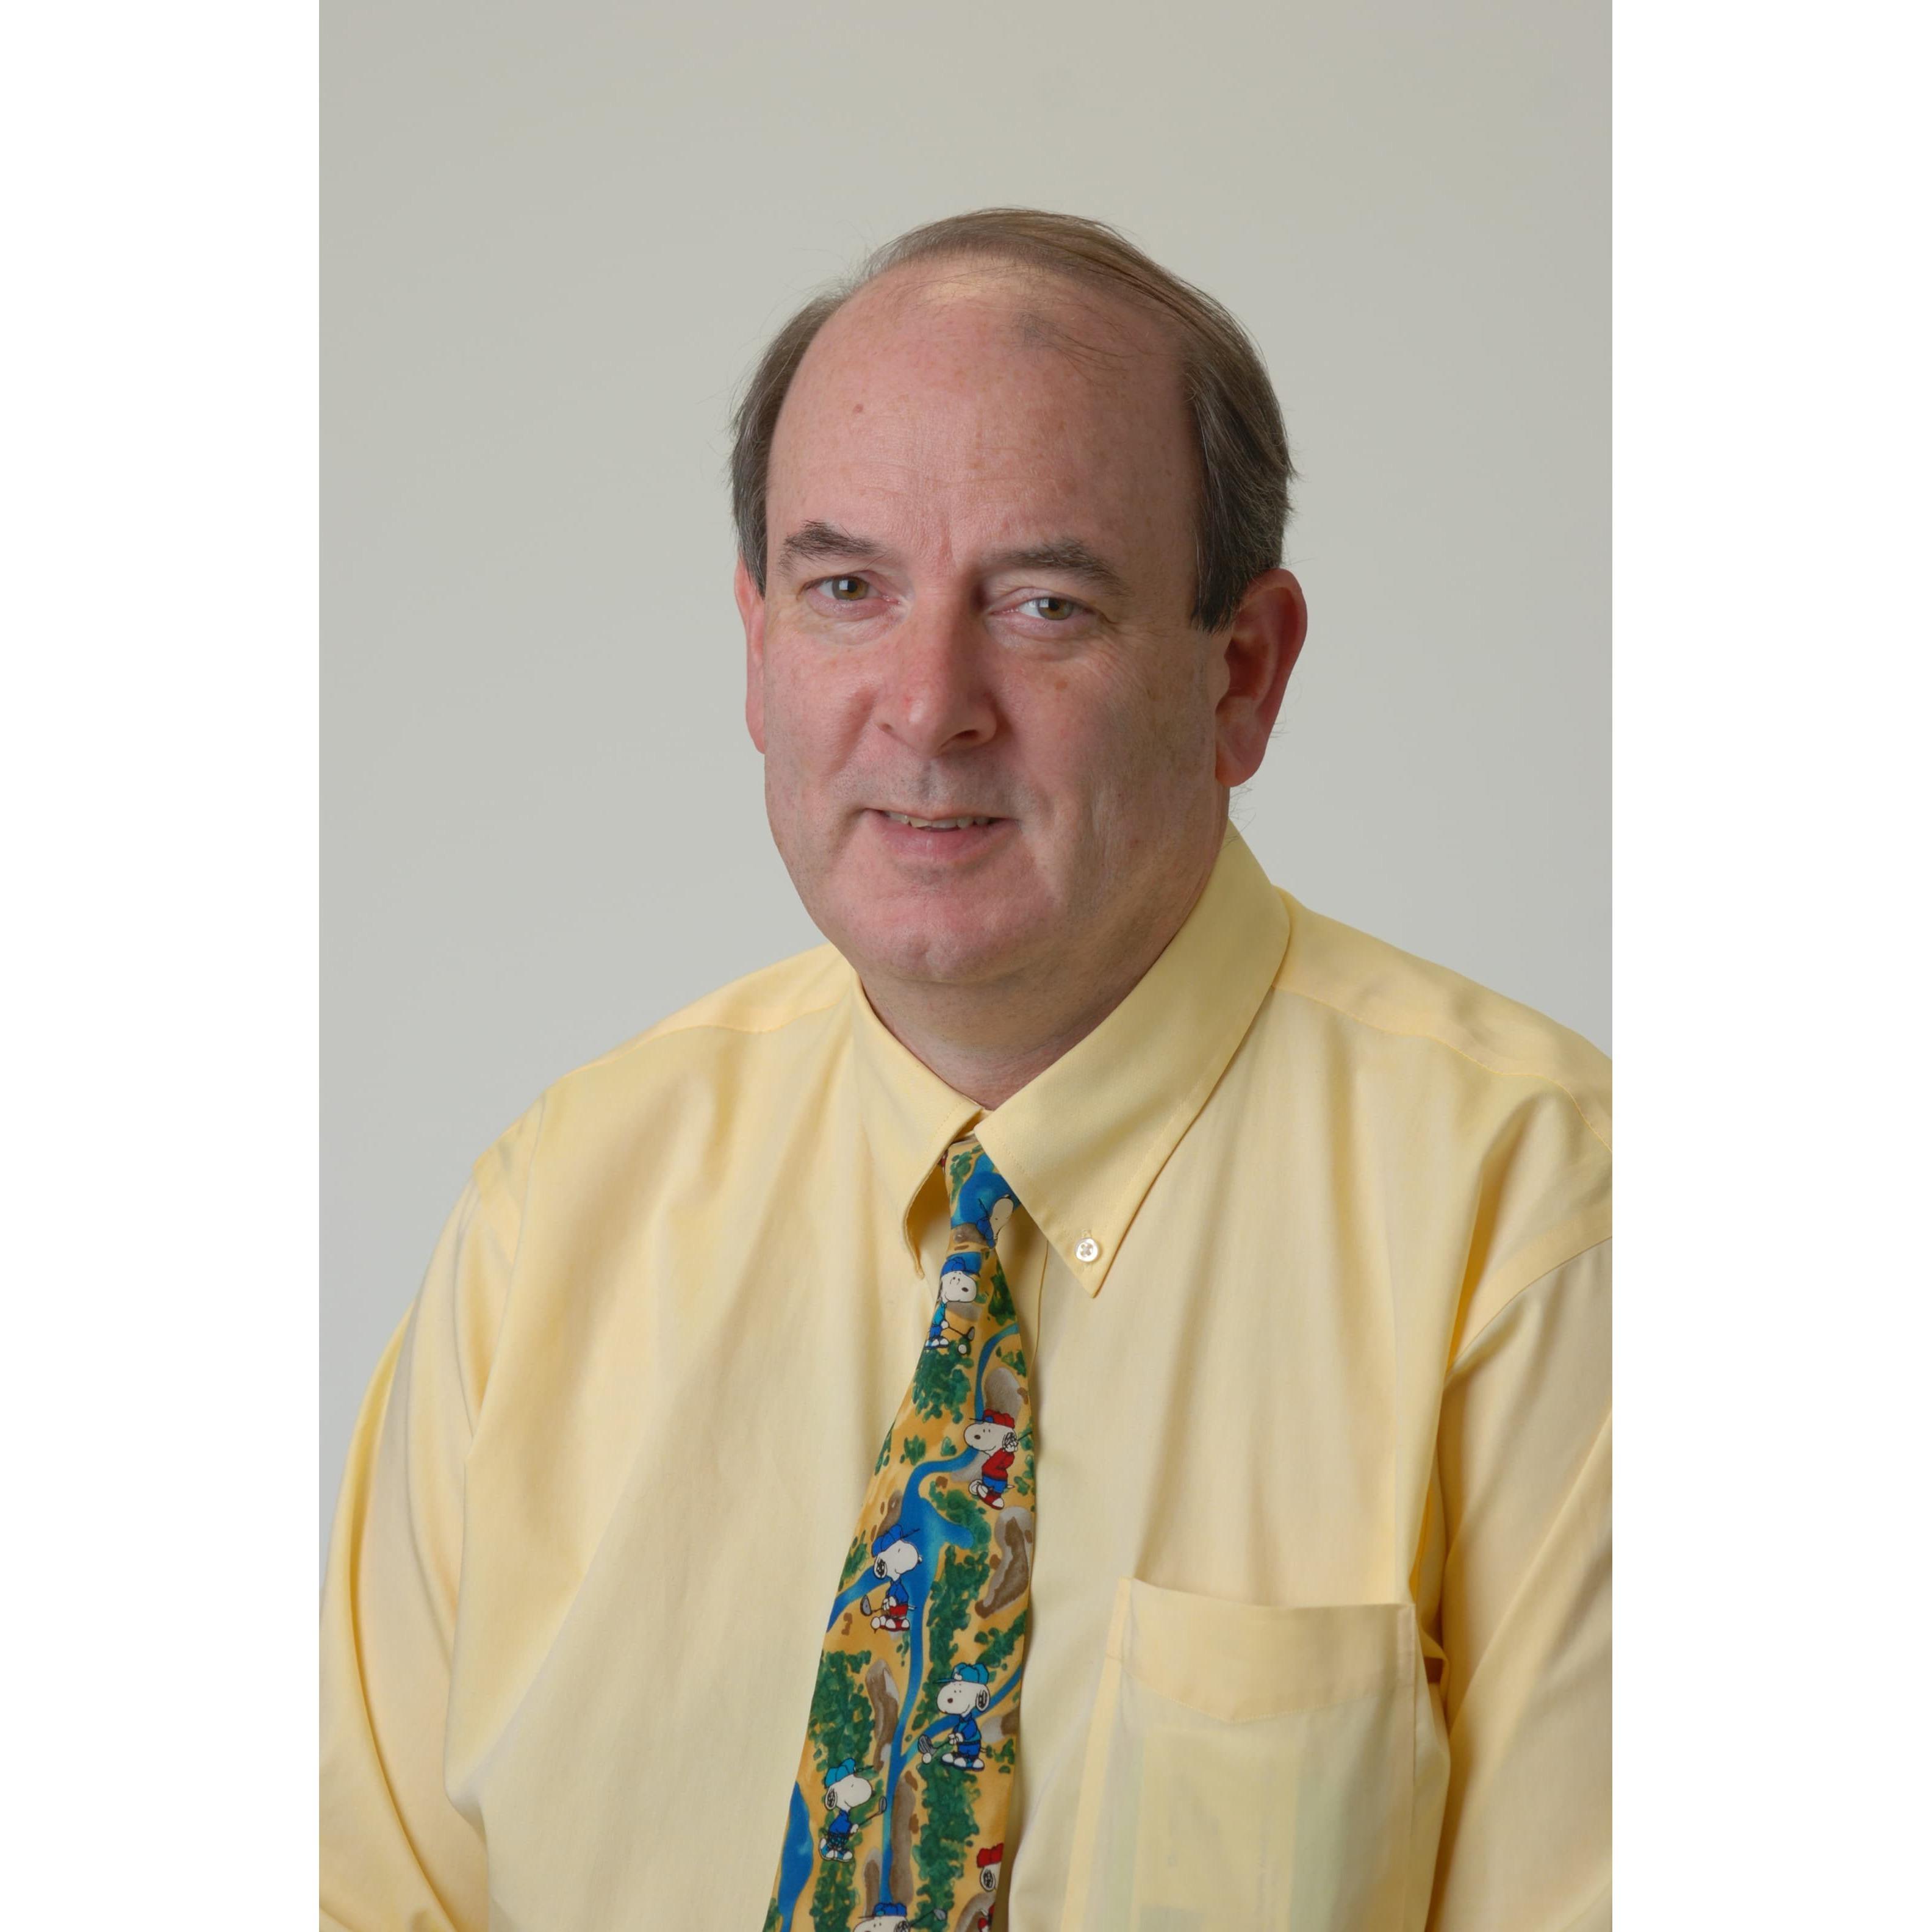 Robert K Darragh, MD